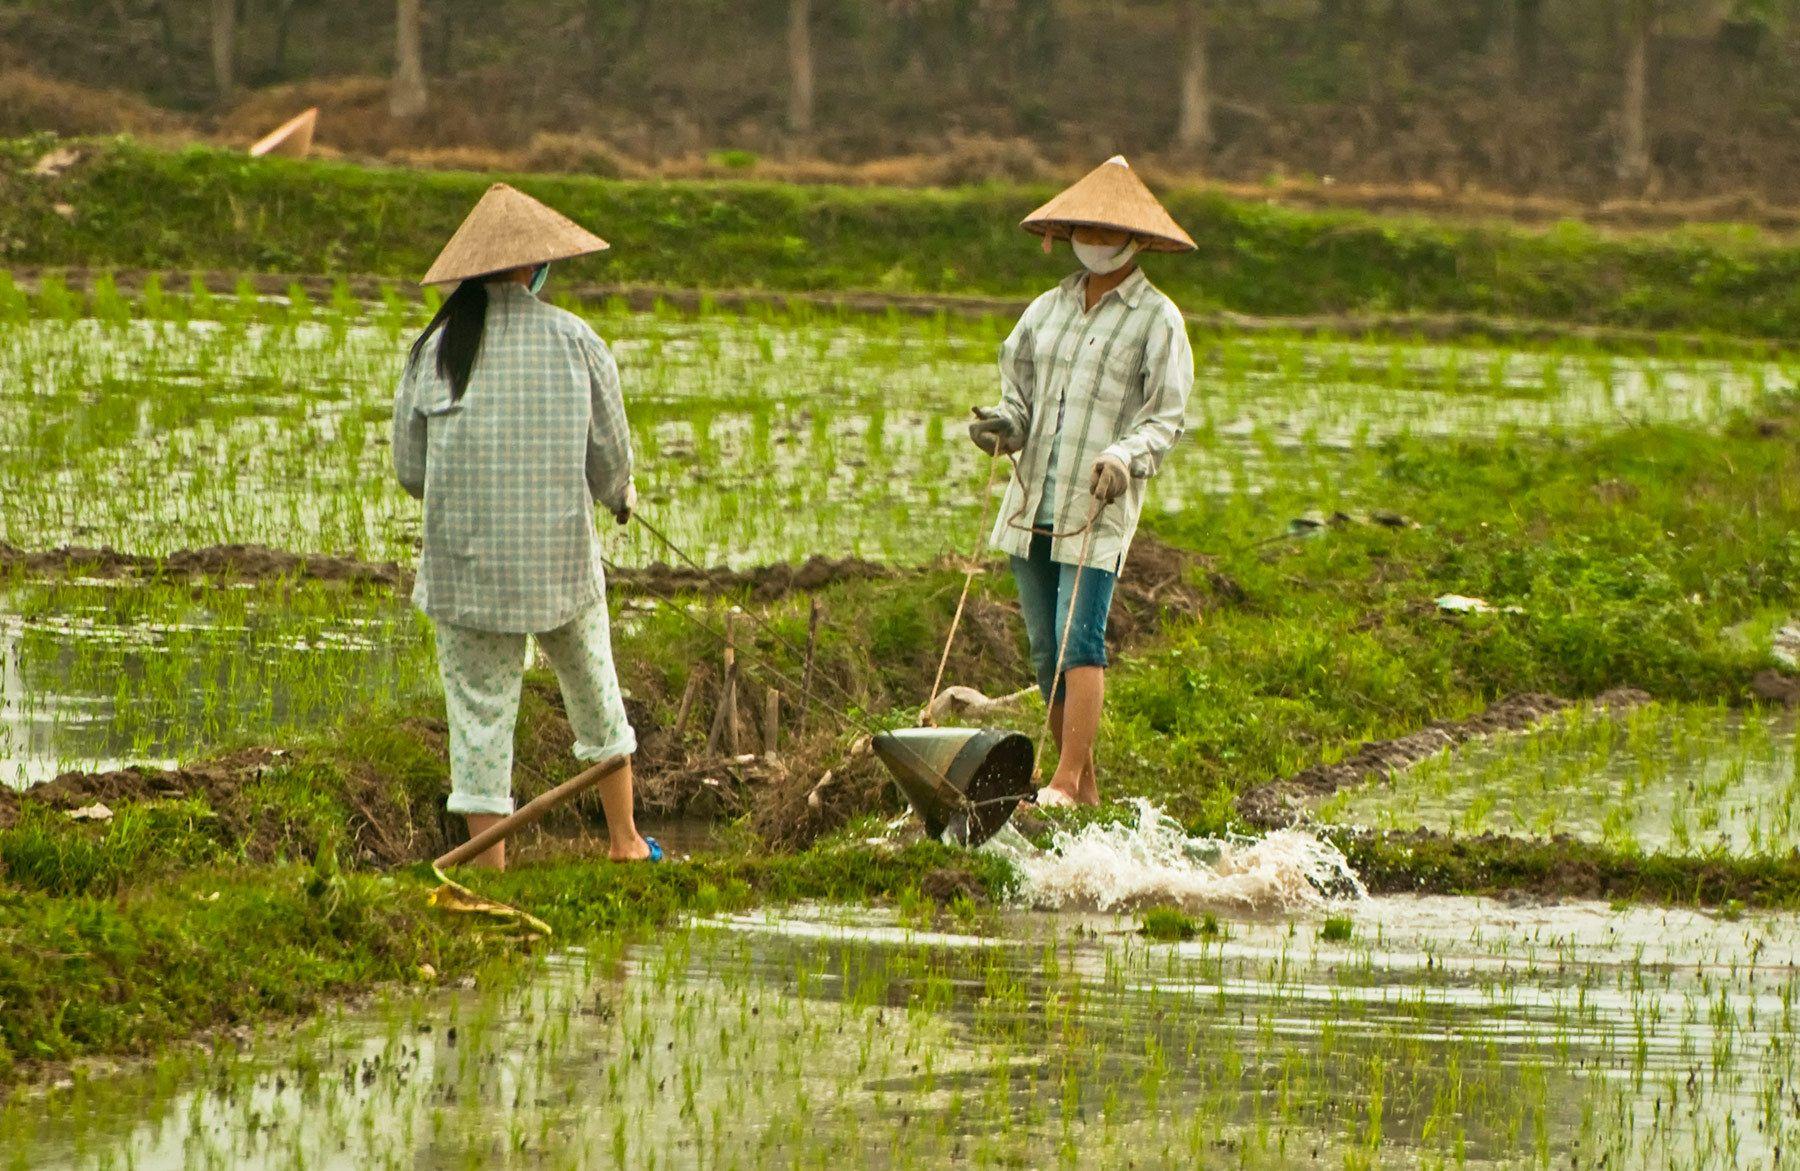 Workers irrigating rice fields, Northern Vietnam